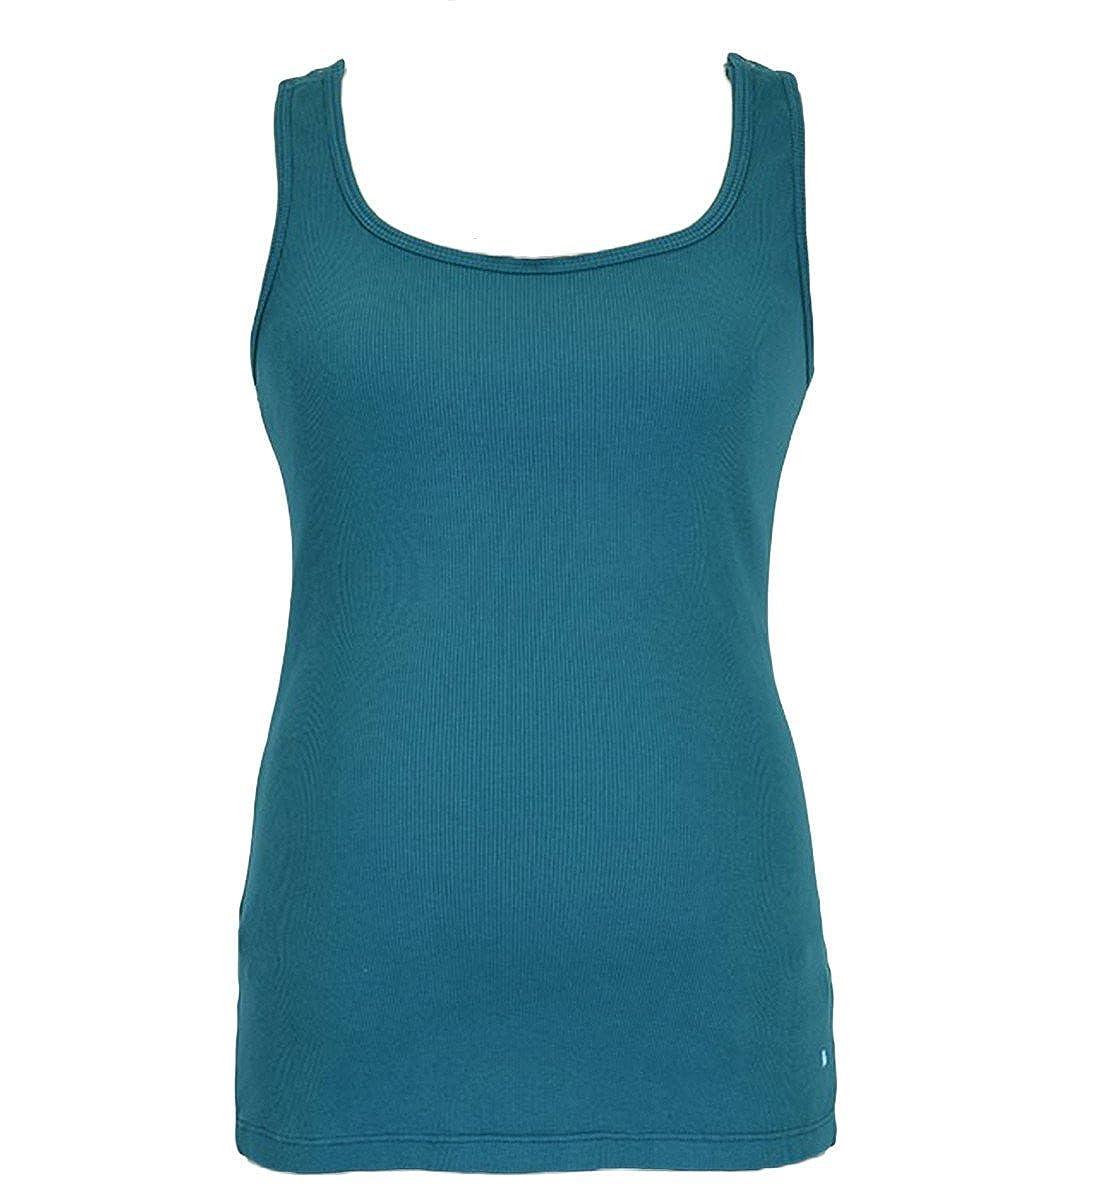 6323207d2572ae Amazon.com  Bun Maternity Women s Maternity Ribbed Snap Nursing Tank Top   Clothing